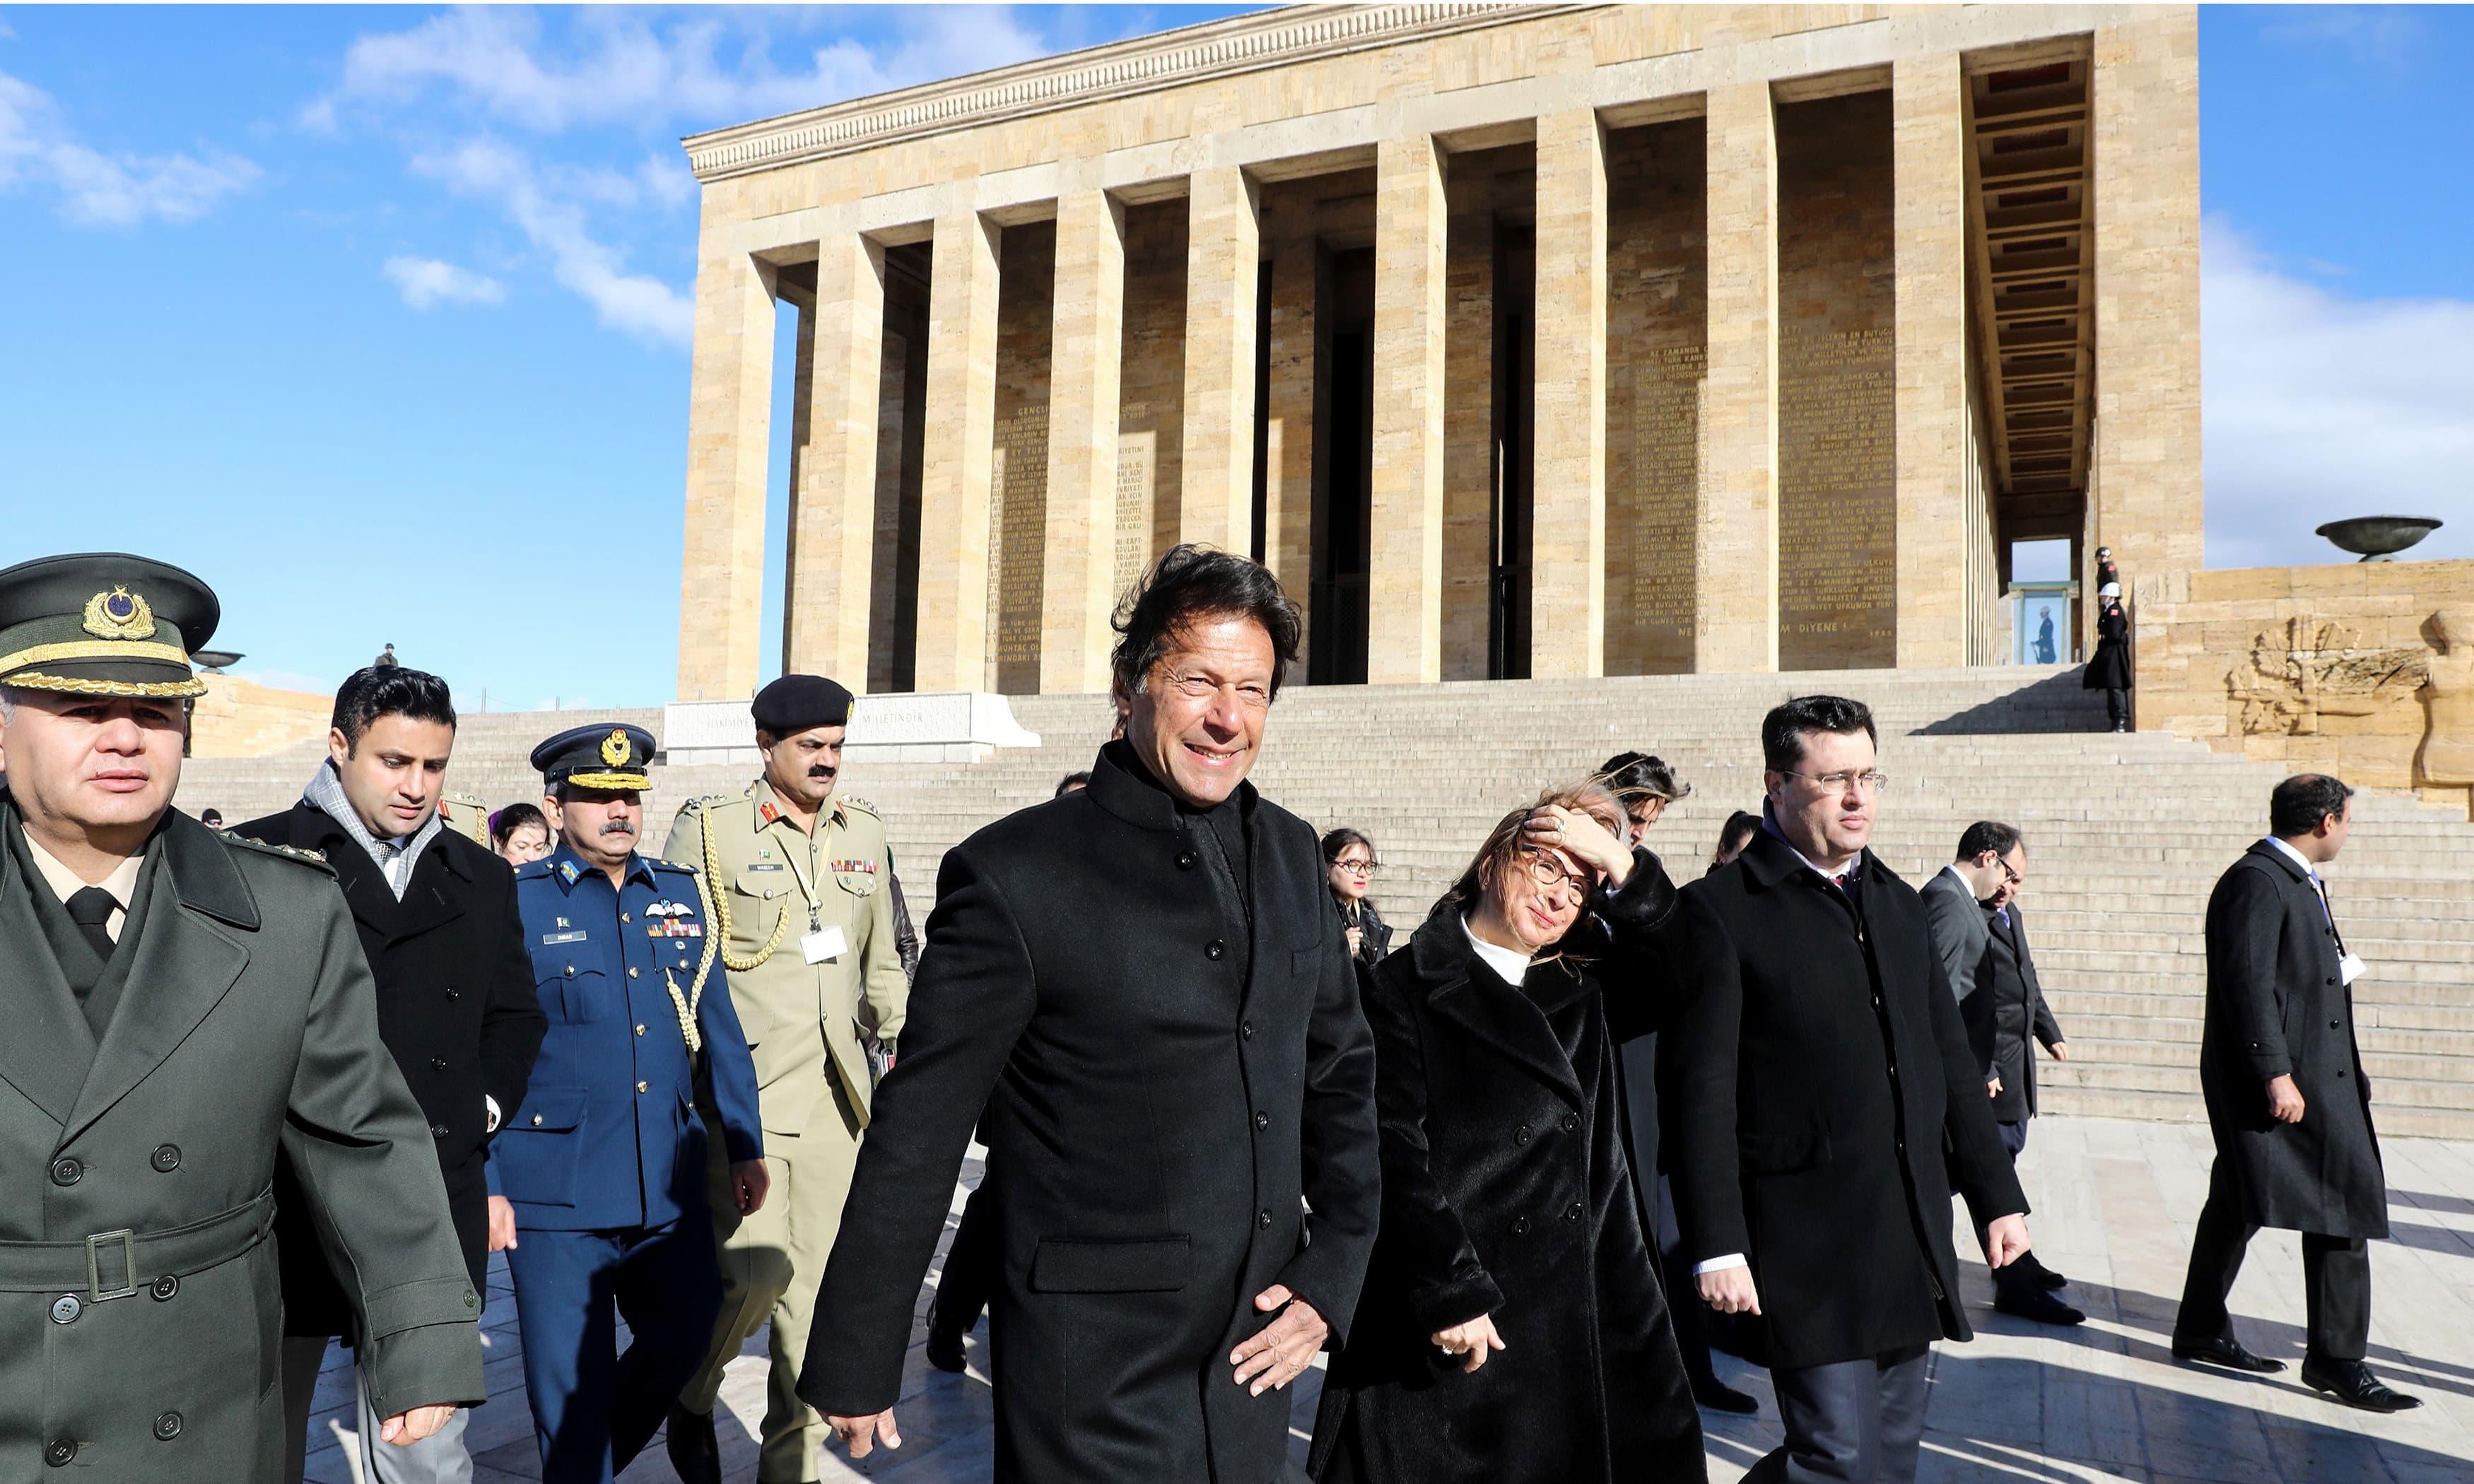 Prime Minister Imran Khan visits Anitkabir, the mausoleum of Turkish Republic's founder Mustafa Kemal Ataturk. —AFP